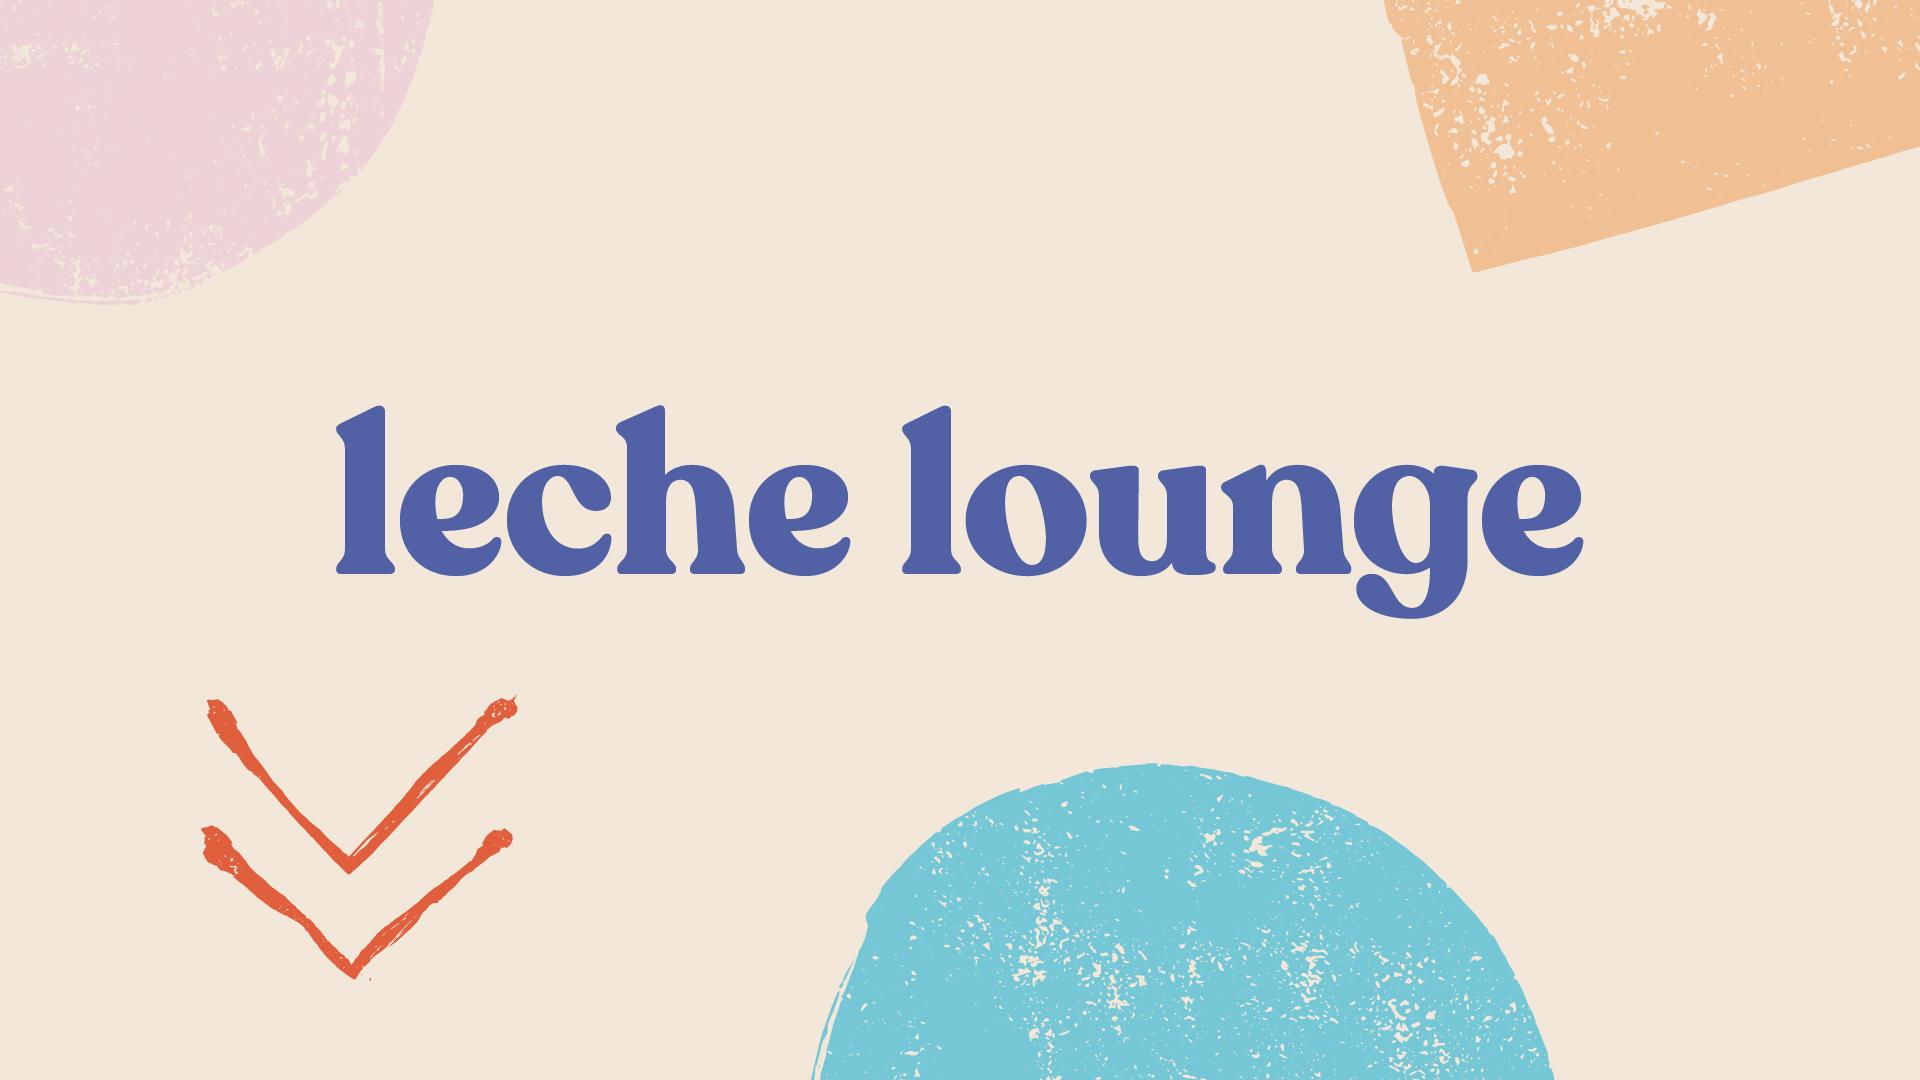 LecheLounge_header-image_1.jpg